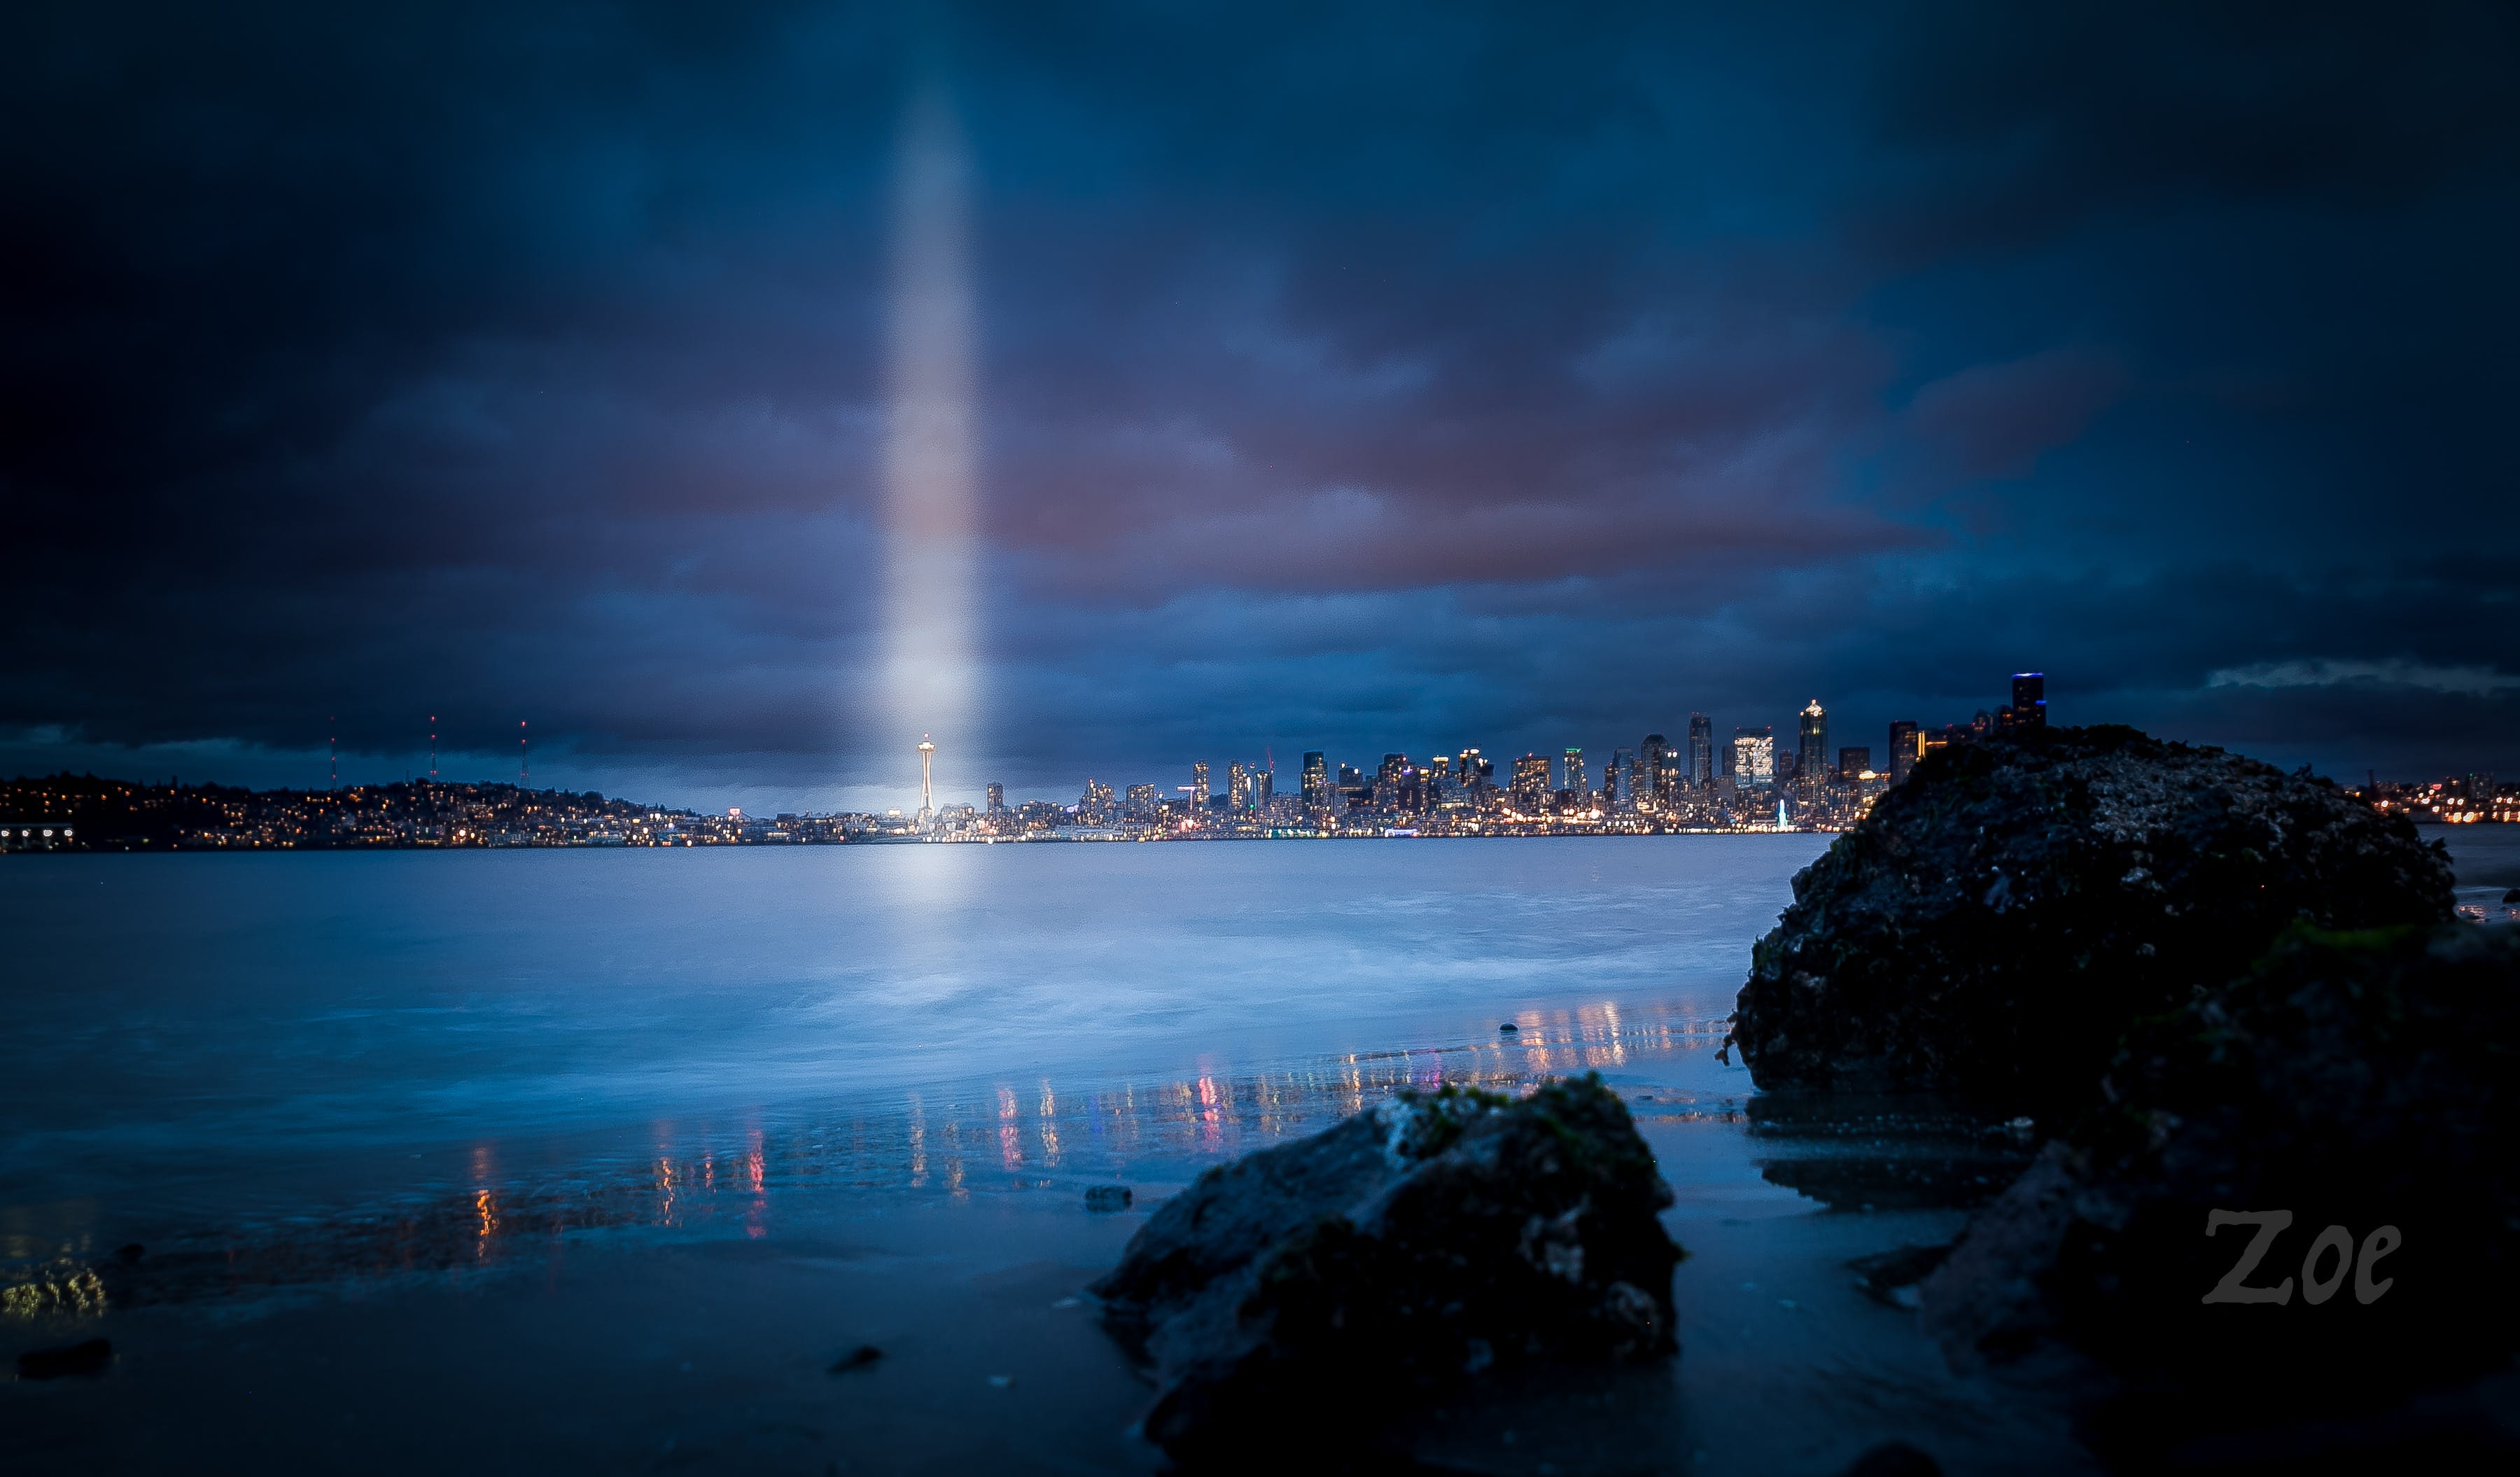 Free stock photo of #seattle #seattleskyline #seascape #cityscape